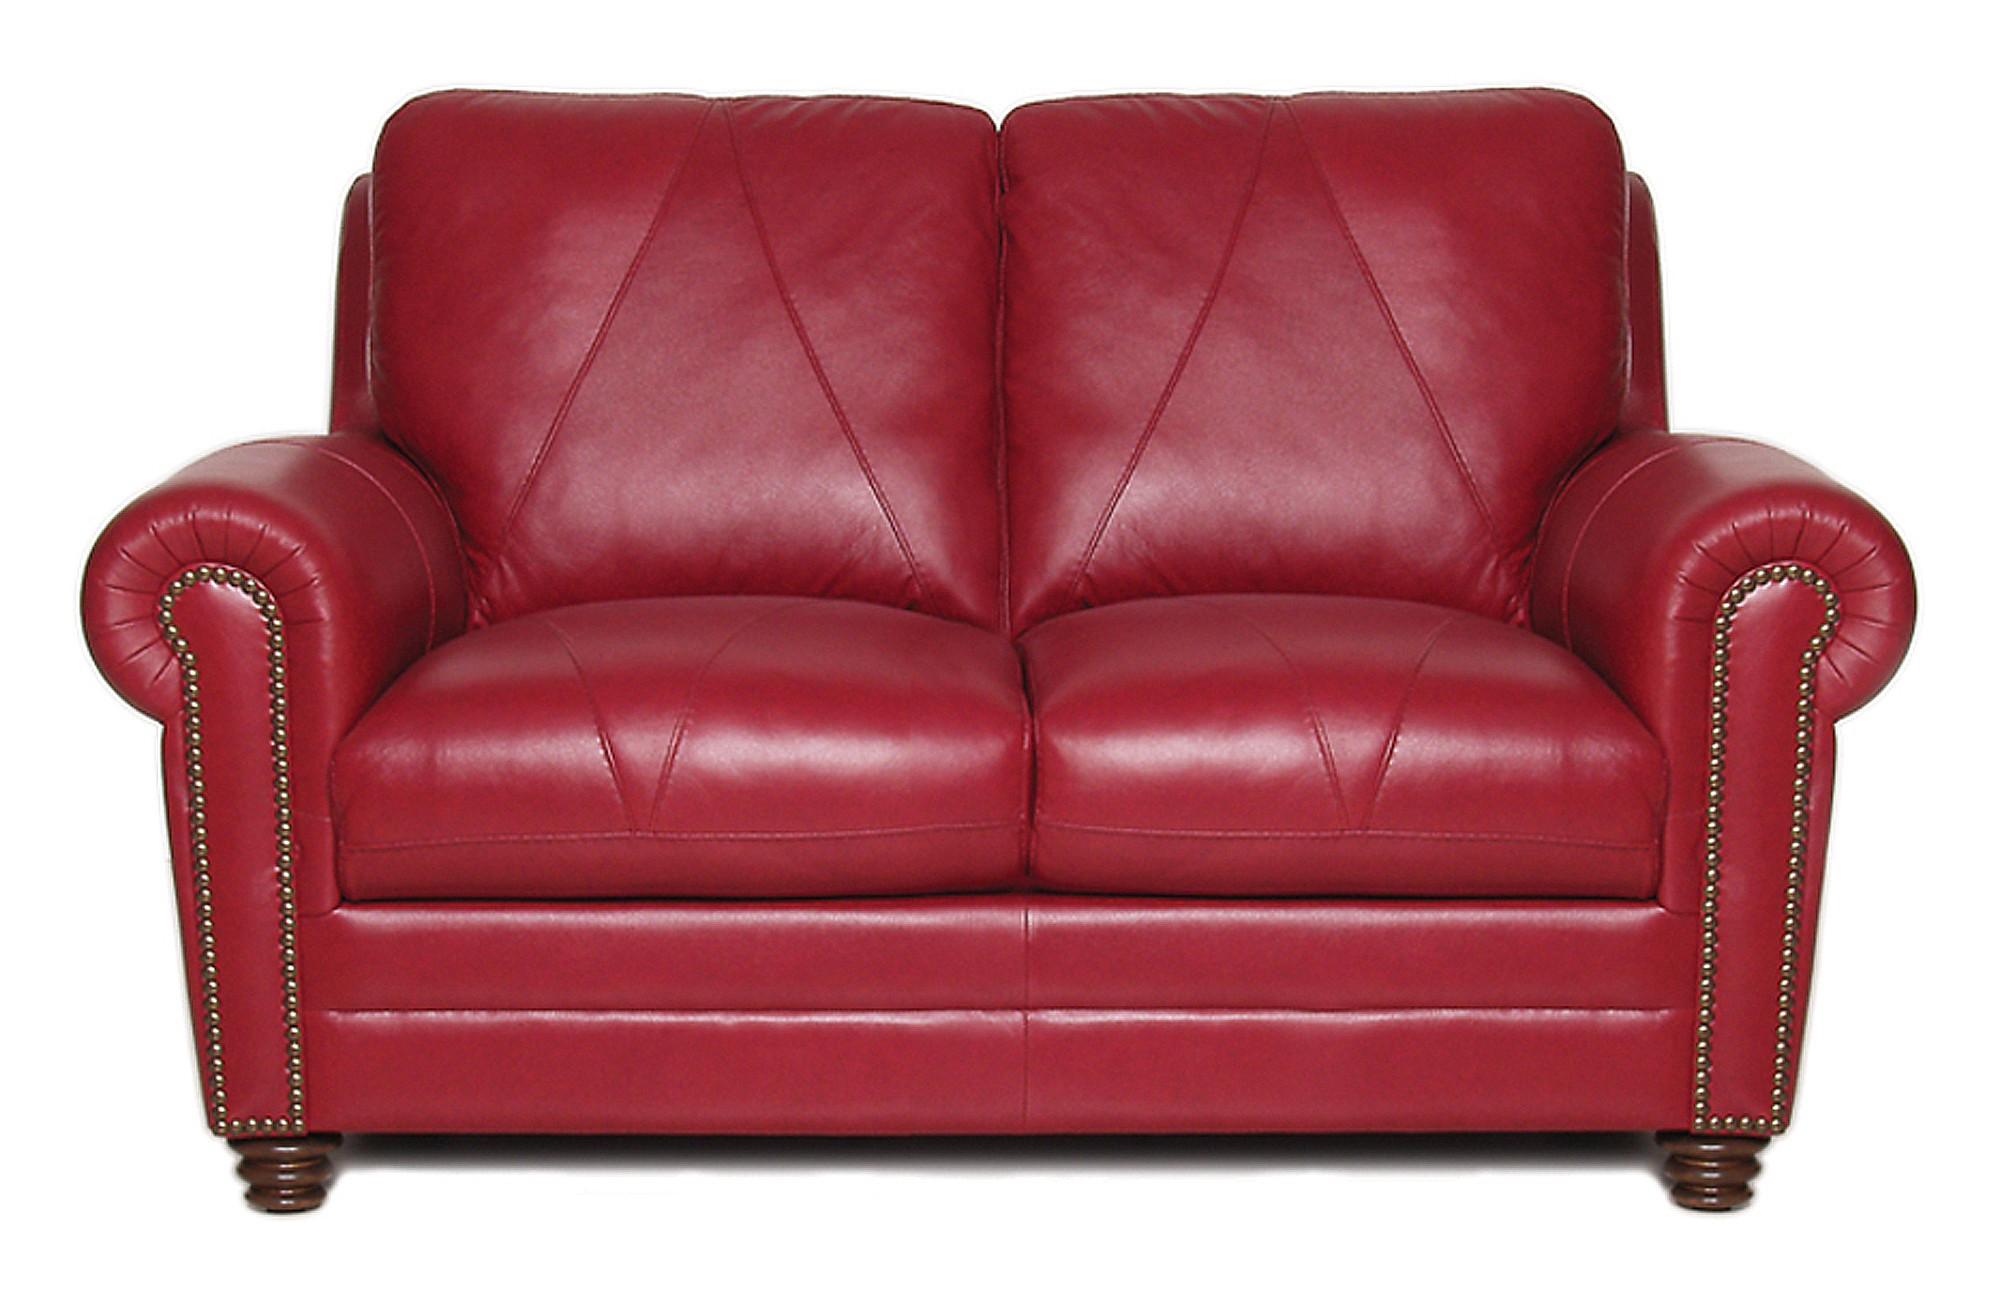 Pleasant Weston Collection Luke Leather Furniture Home Interior And Landscaping Mentranervesignezvosmurscom